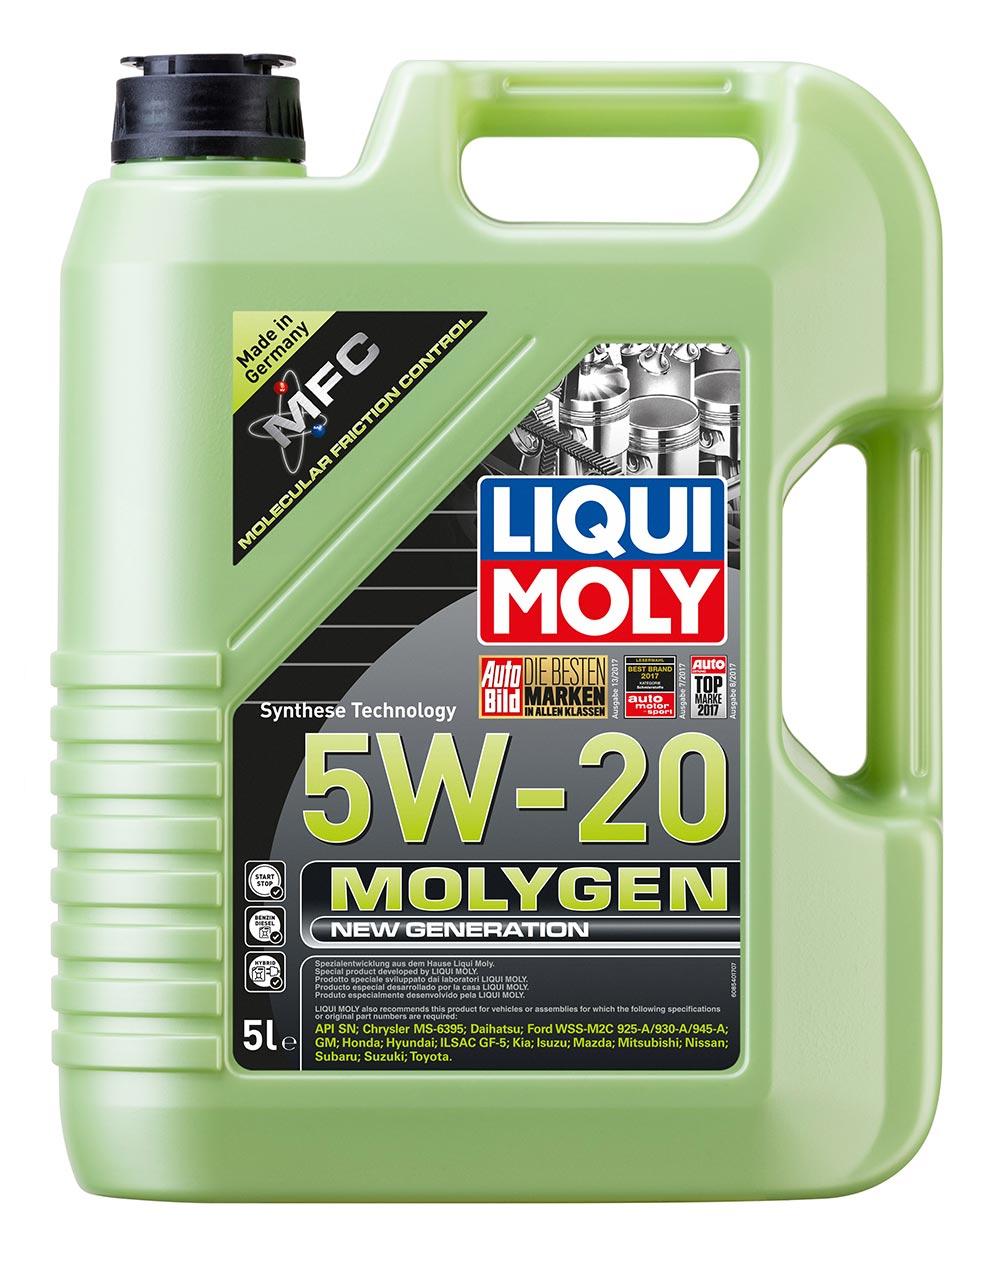 Масло моторное синт.5W20 Molygen New Generation 5л API SN ILSAC GF-5 Chrysler MS